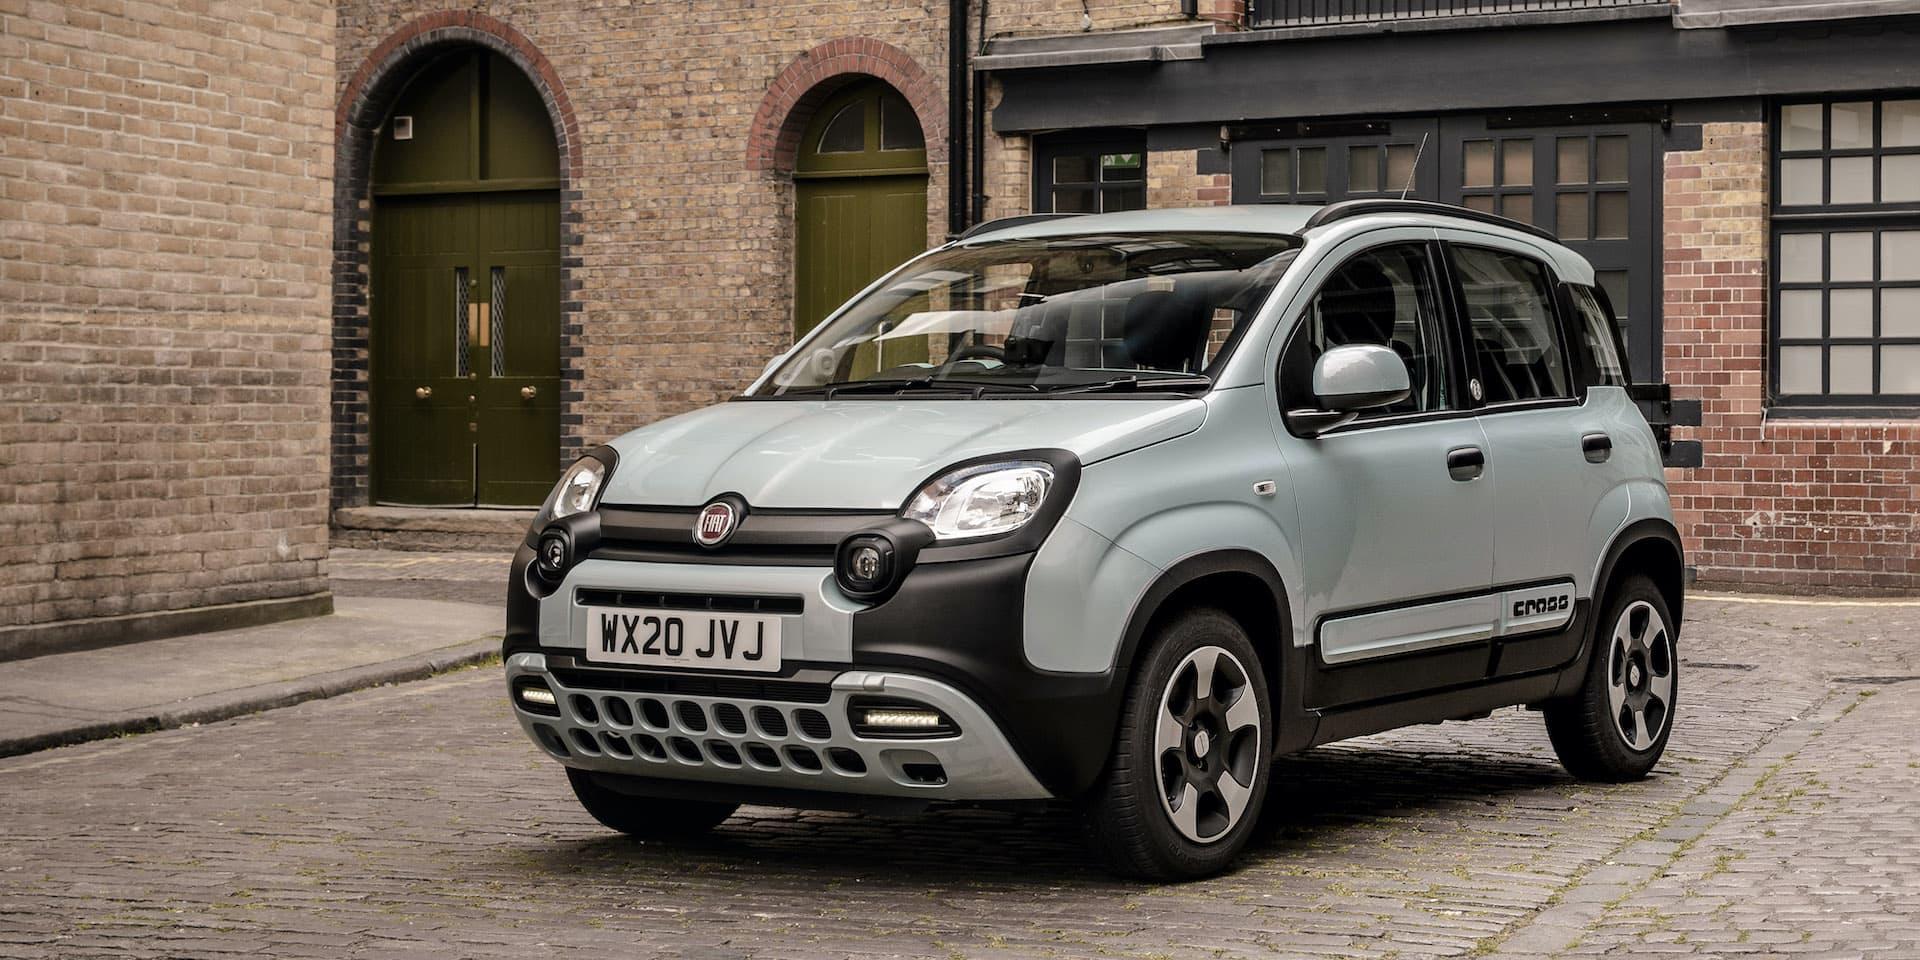 Fiat Panda mild hybrid (2020) – Expert Rating